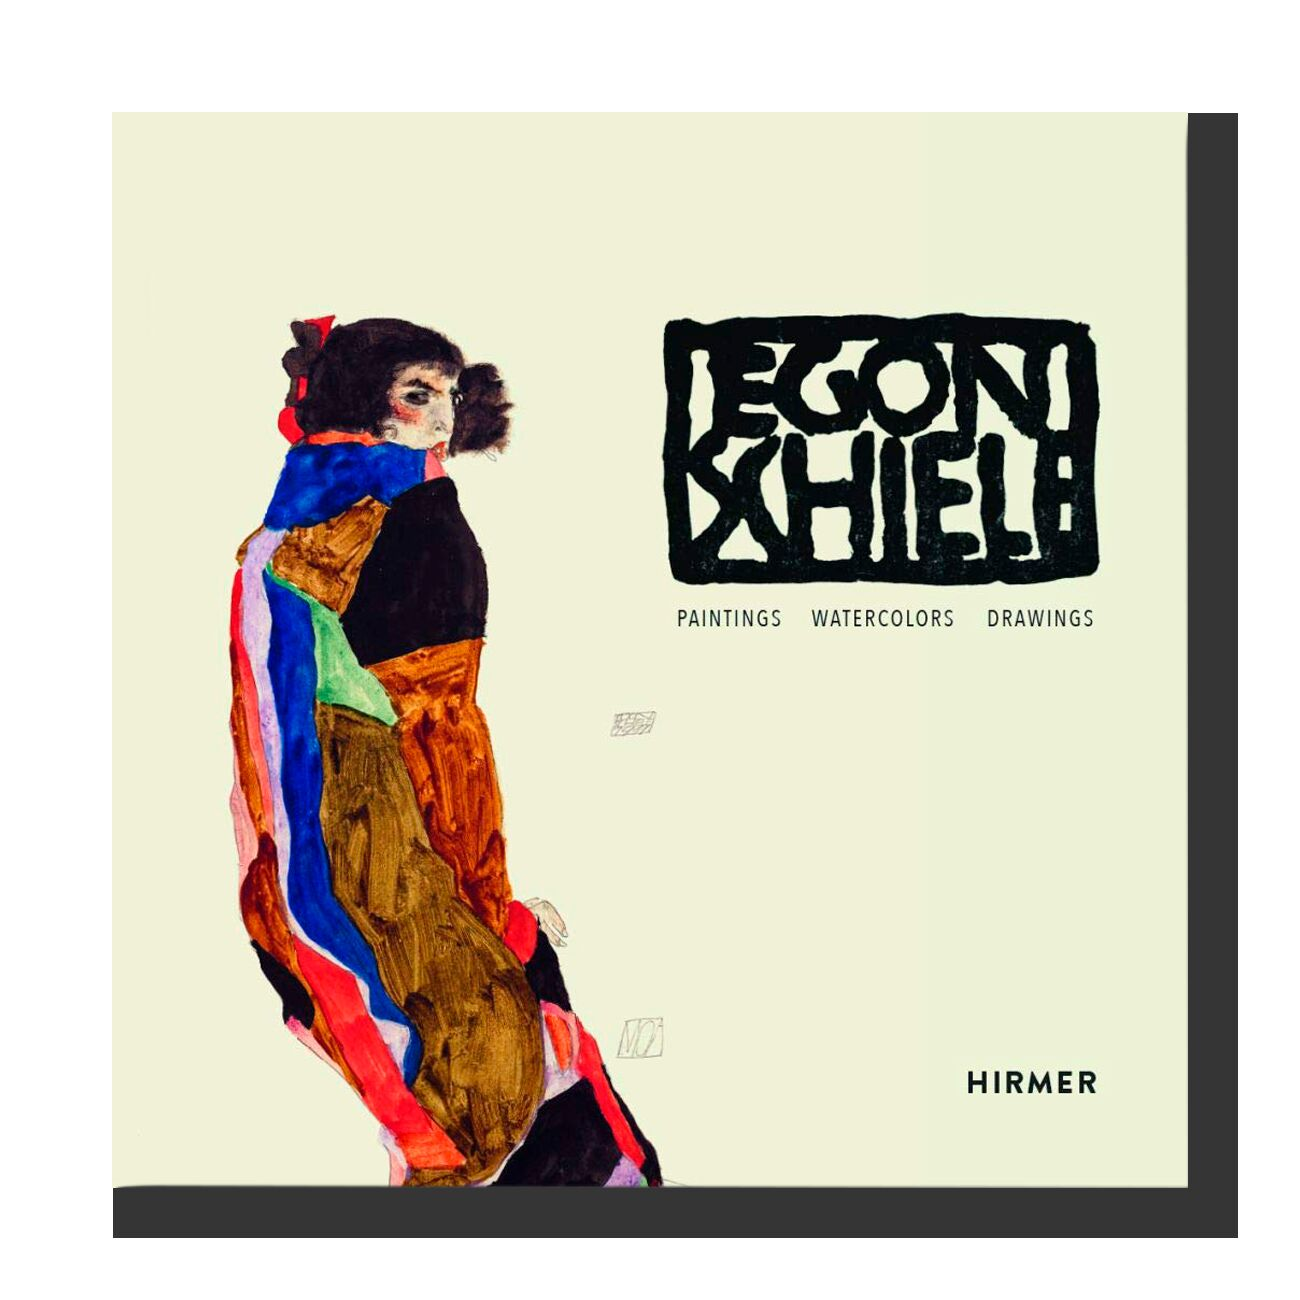 Egon Schiele: Paintings, Watercolours, Drawing